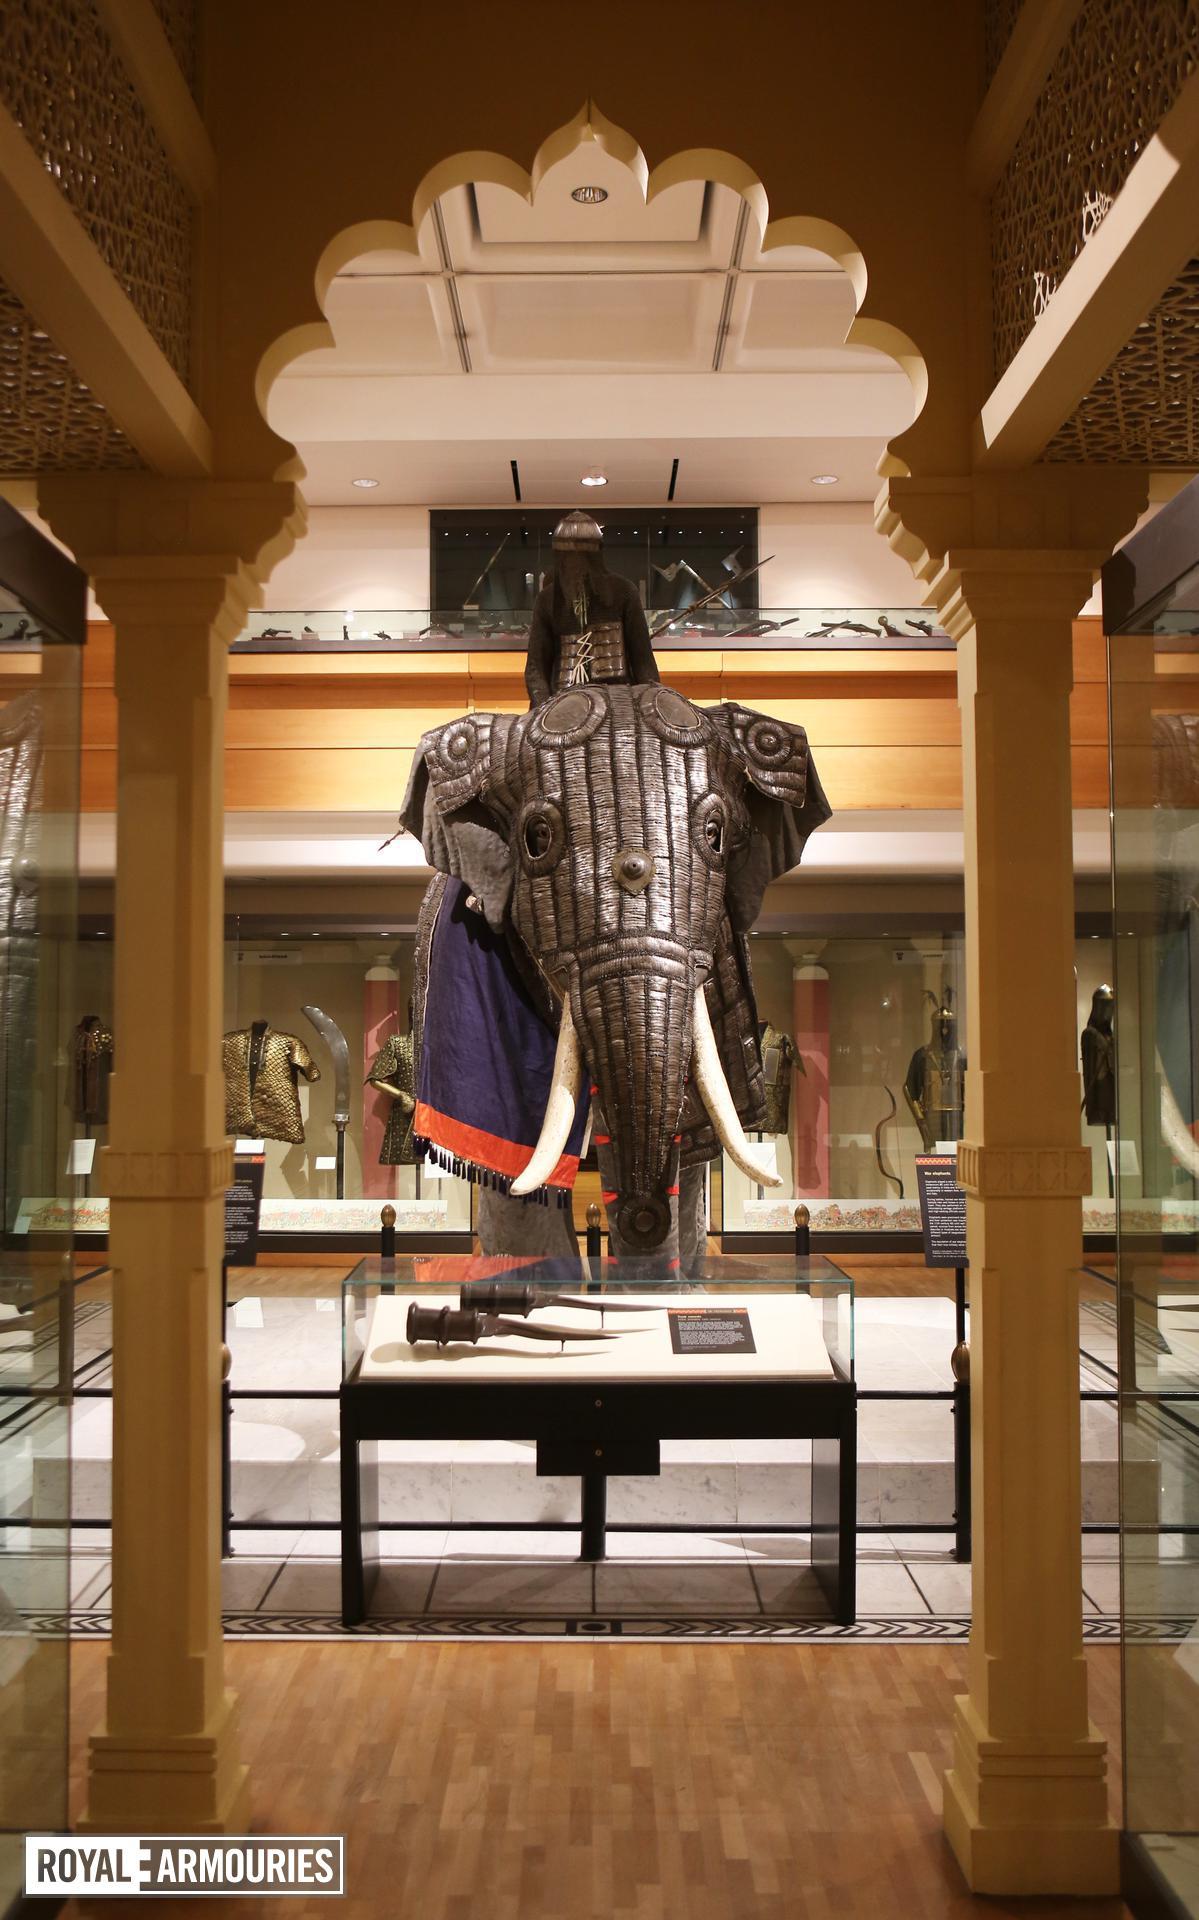 Elephant armour (bargustavan-i-pil), India, about 1600 XXVIA.102